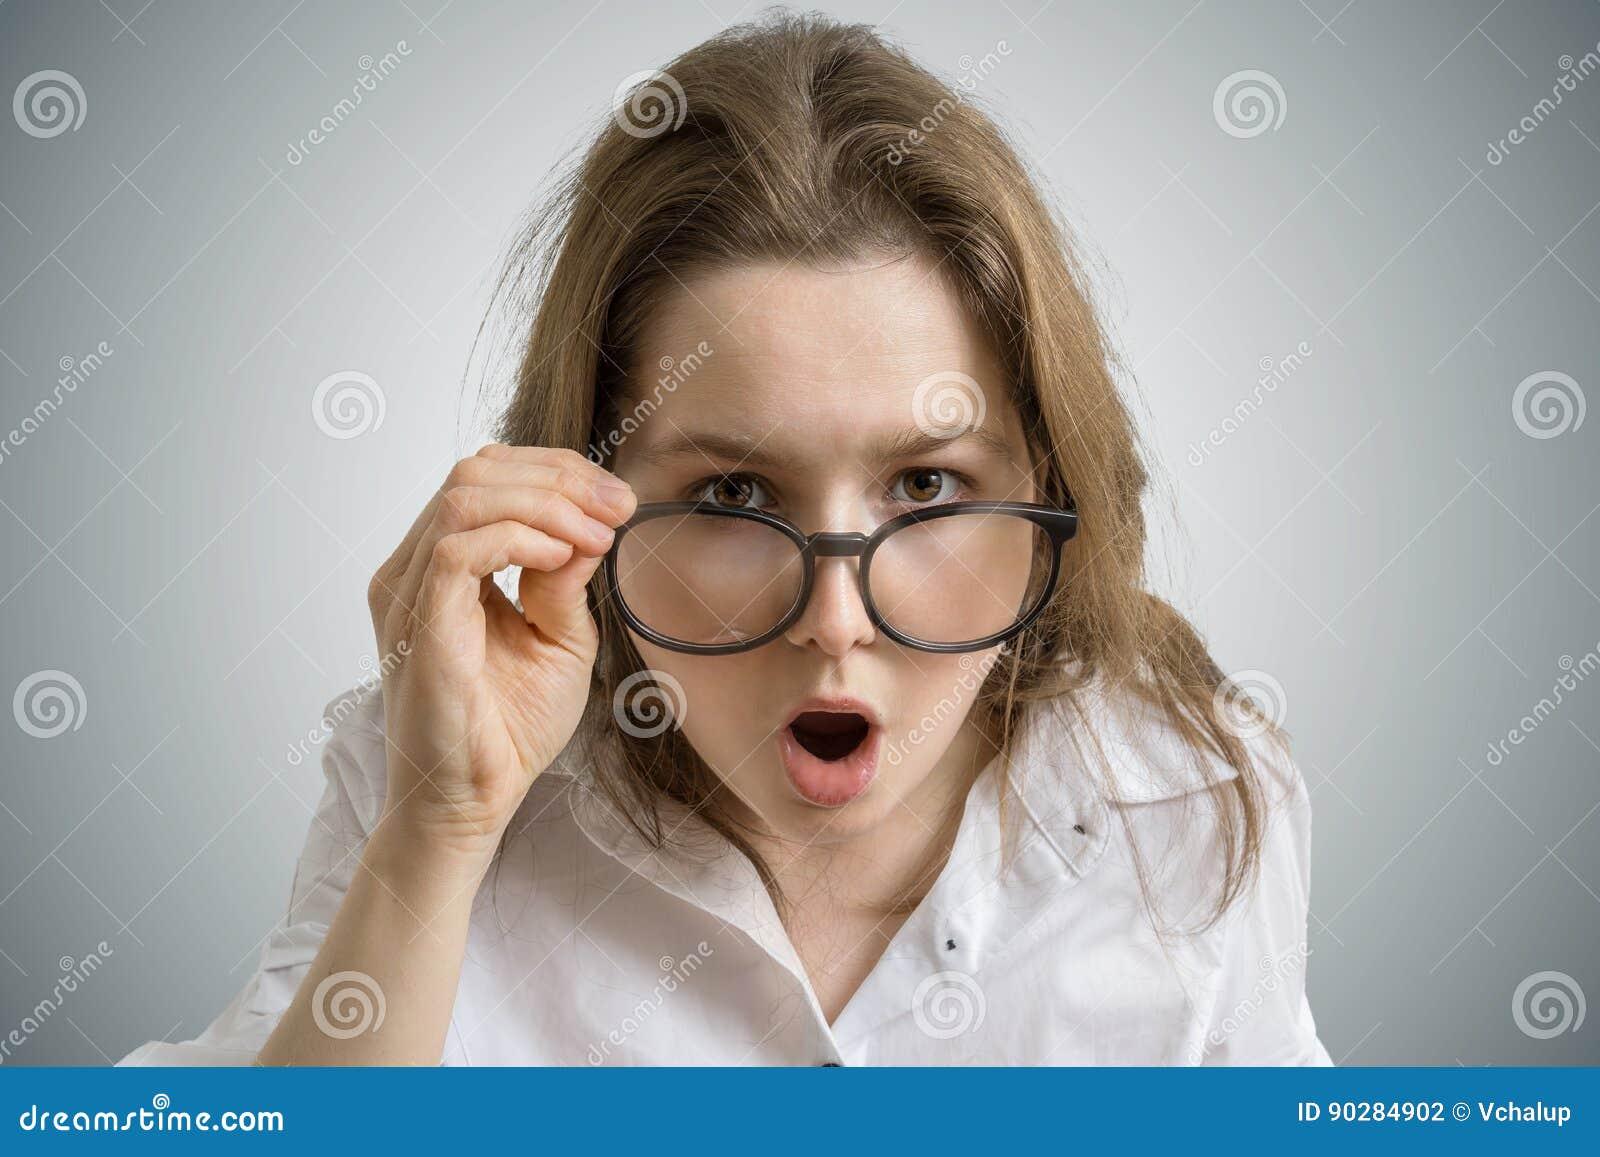 5c29fc5563 Η νέα αστεία γυναίκα με τα γυαλιά είναι συγκλονισμένη και έκπληκτη ...